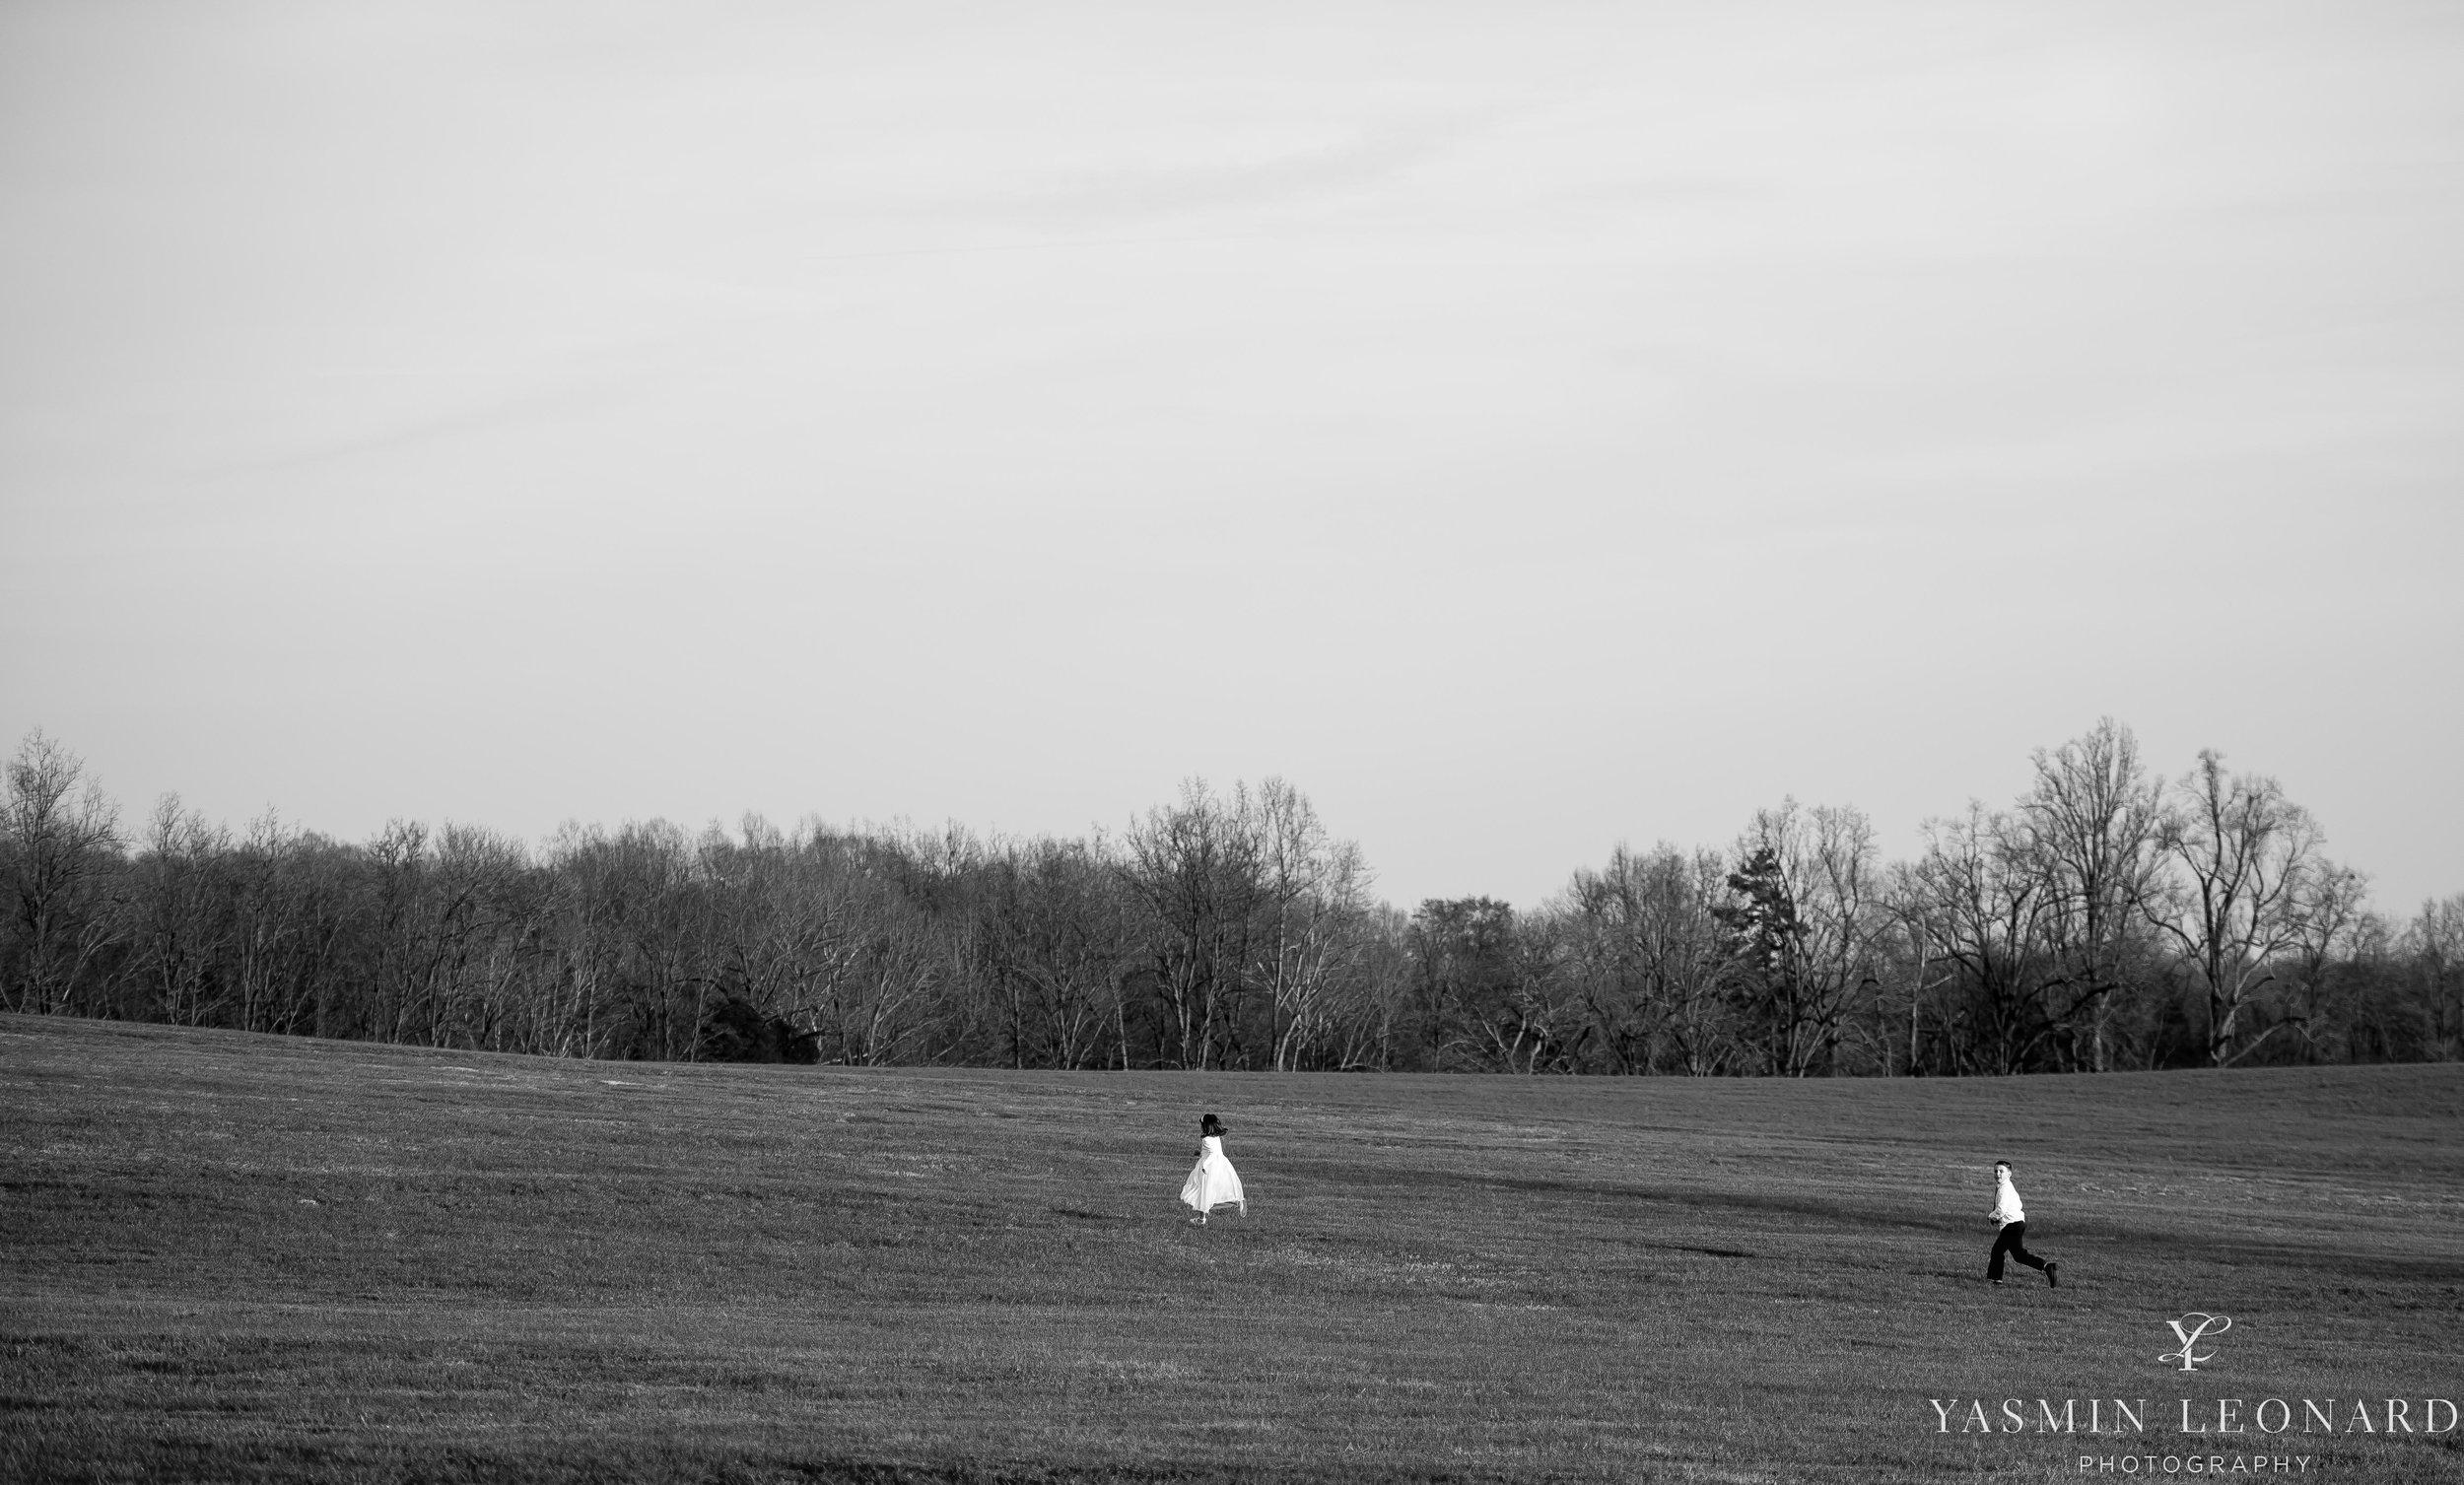 Adaumont Farm - Adaumont Farm Weddings - Trinity Weddings - NC Weddings - Yasmin Leonard Photography-56.jpg